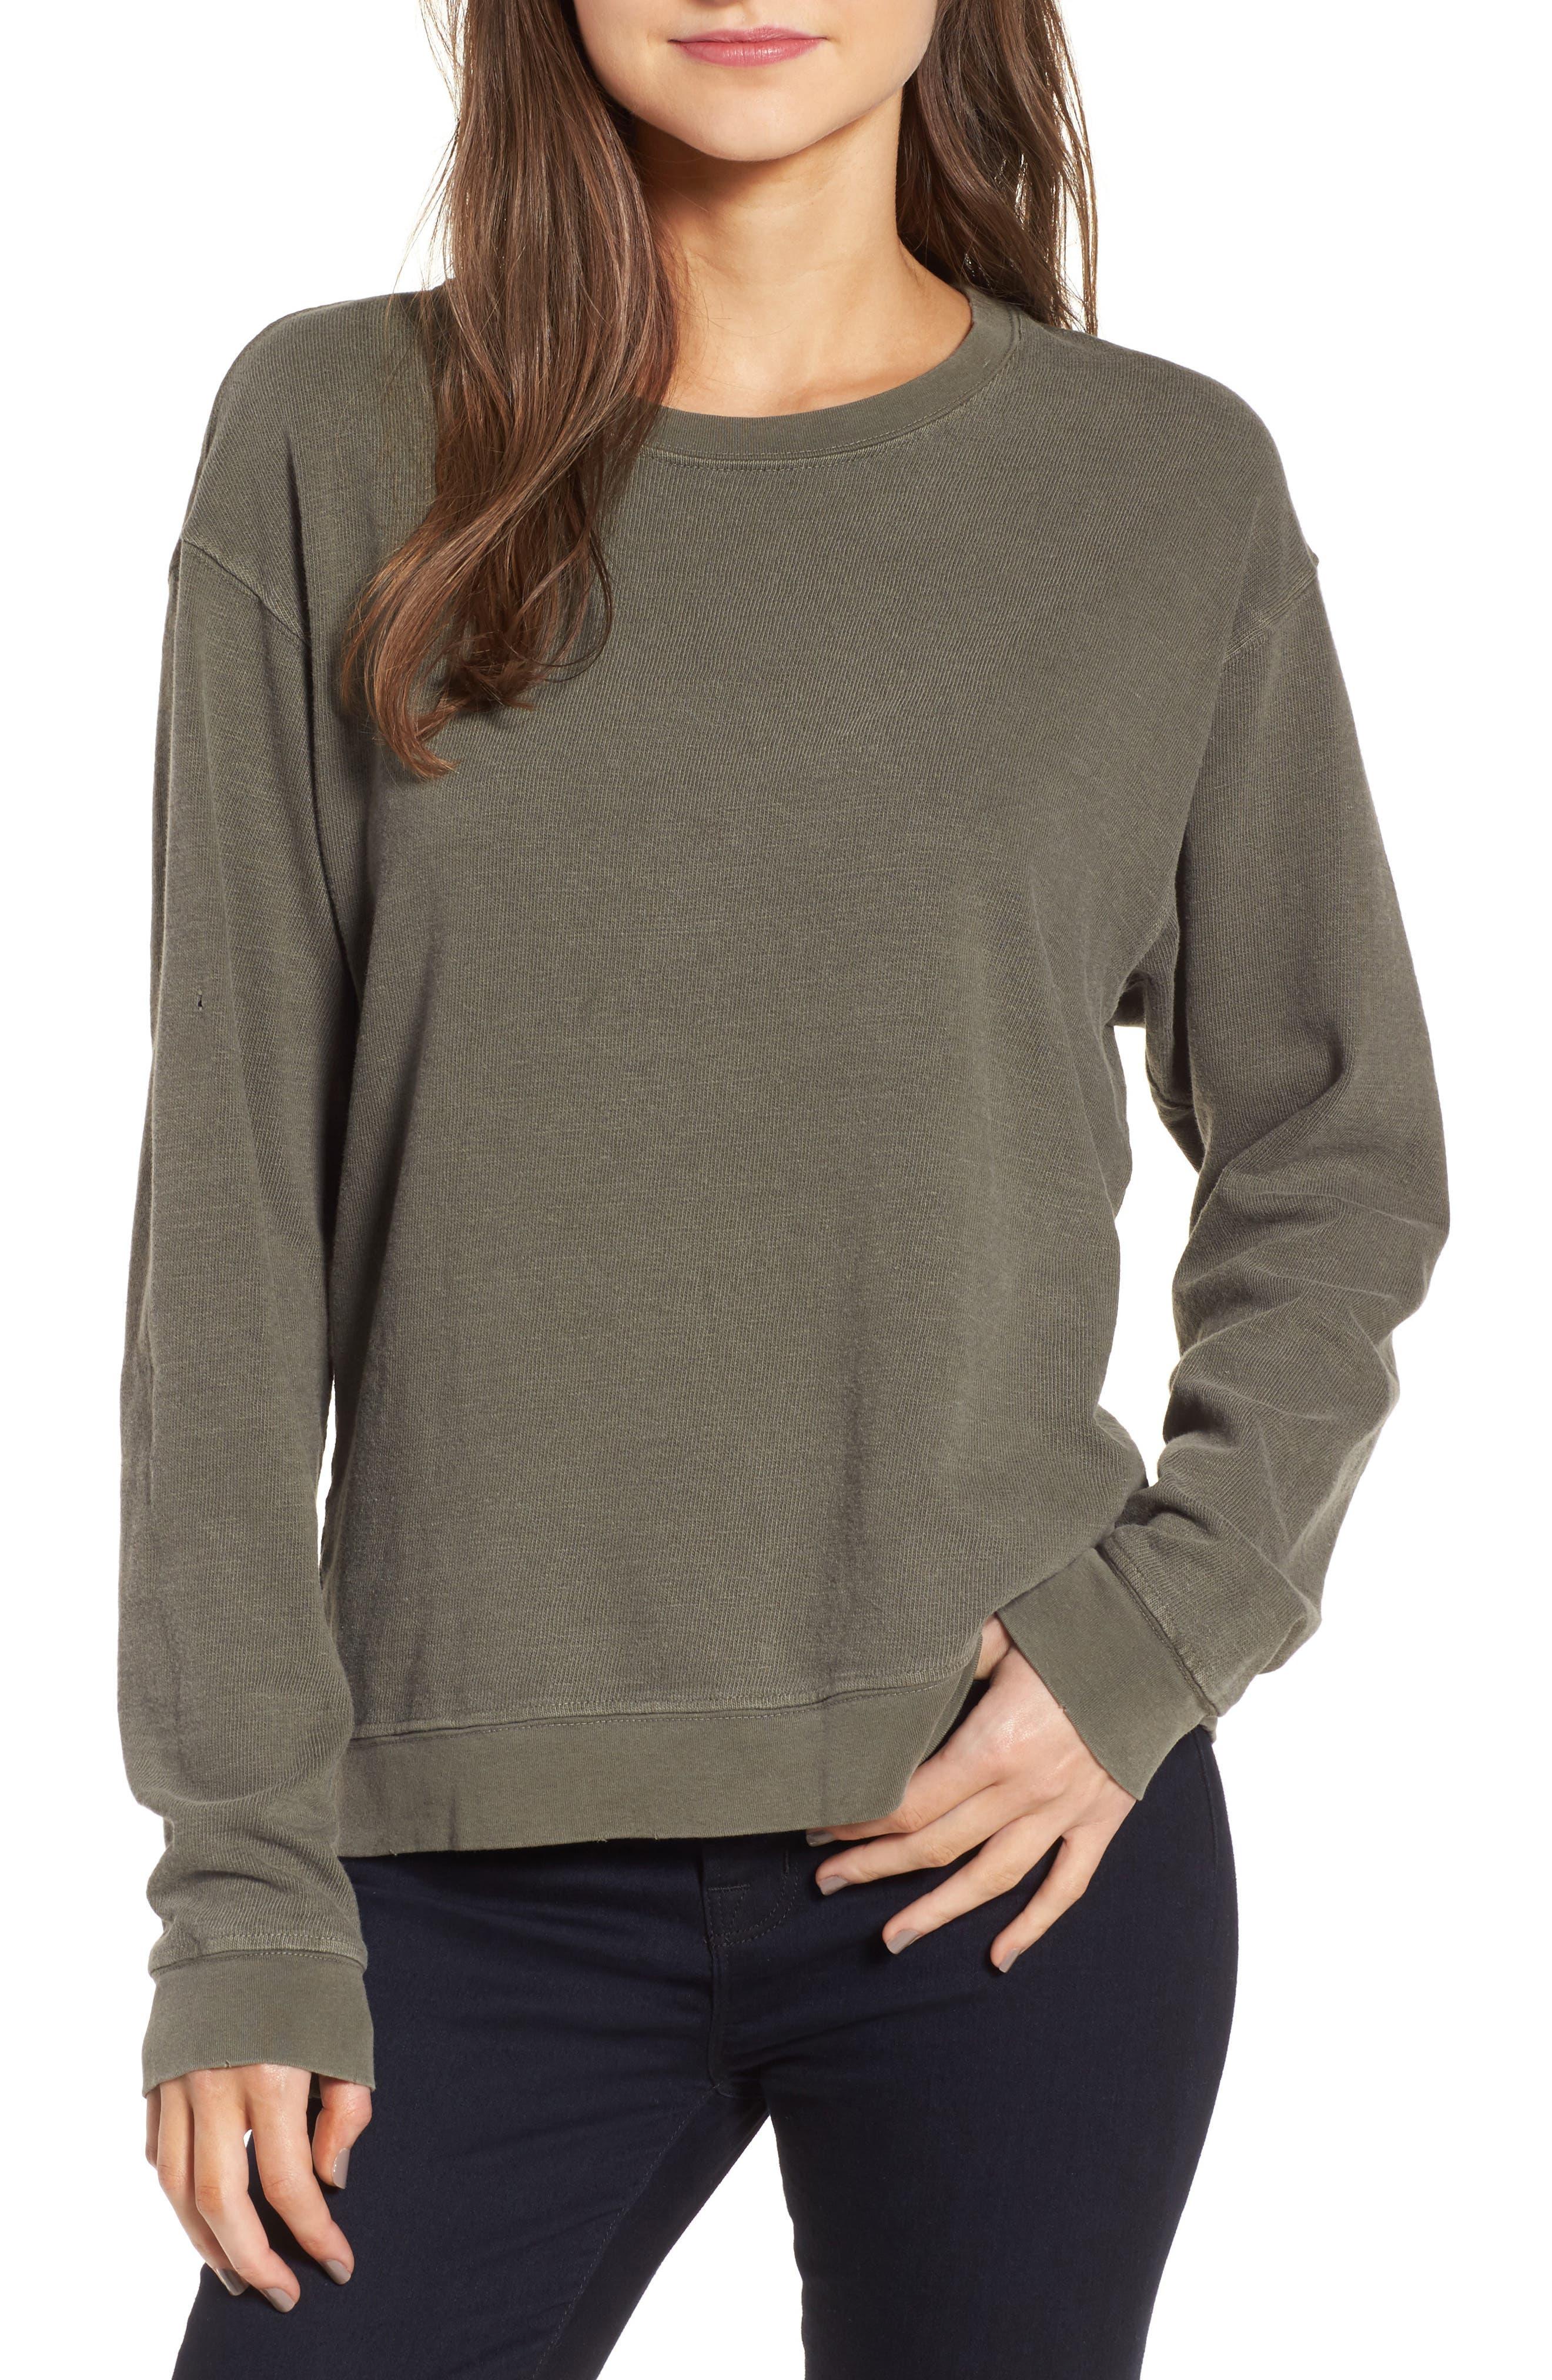 Main Image - James Perse Distressed Sweatshirt